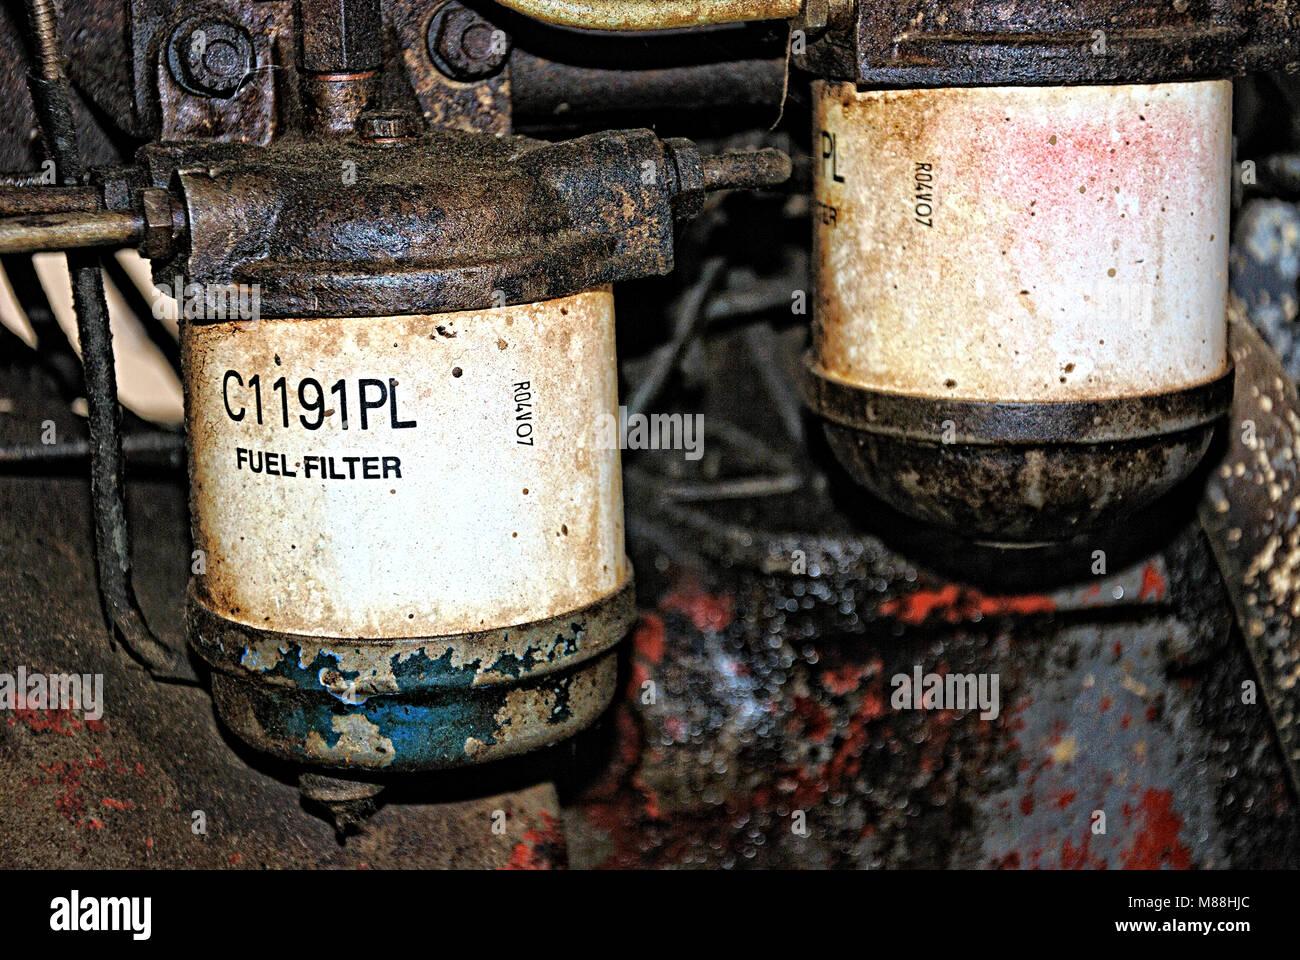 Fuel Filter Stock Photos Images Alamy Perkins Filters A C1191pl Image